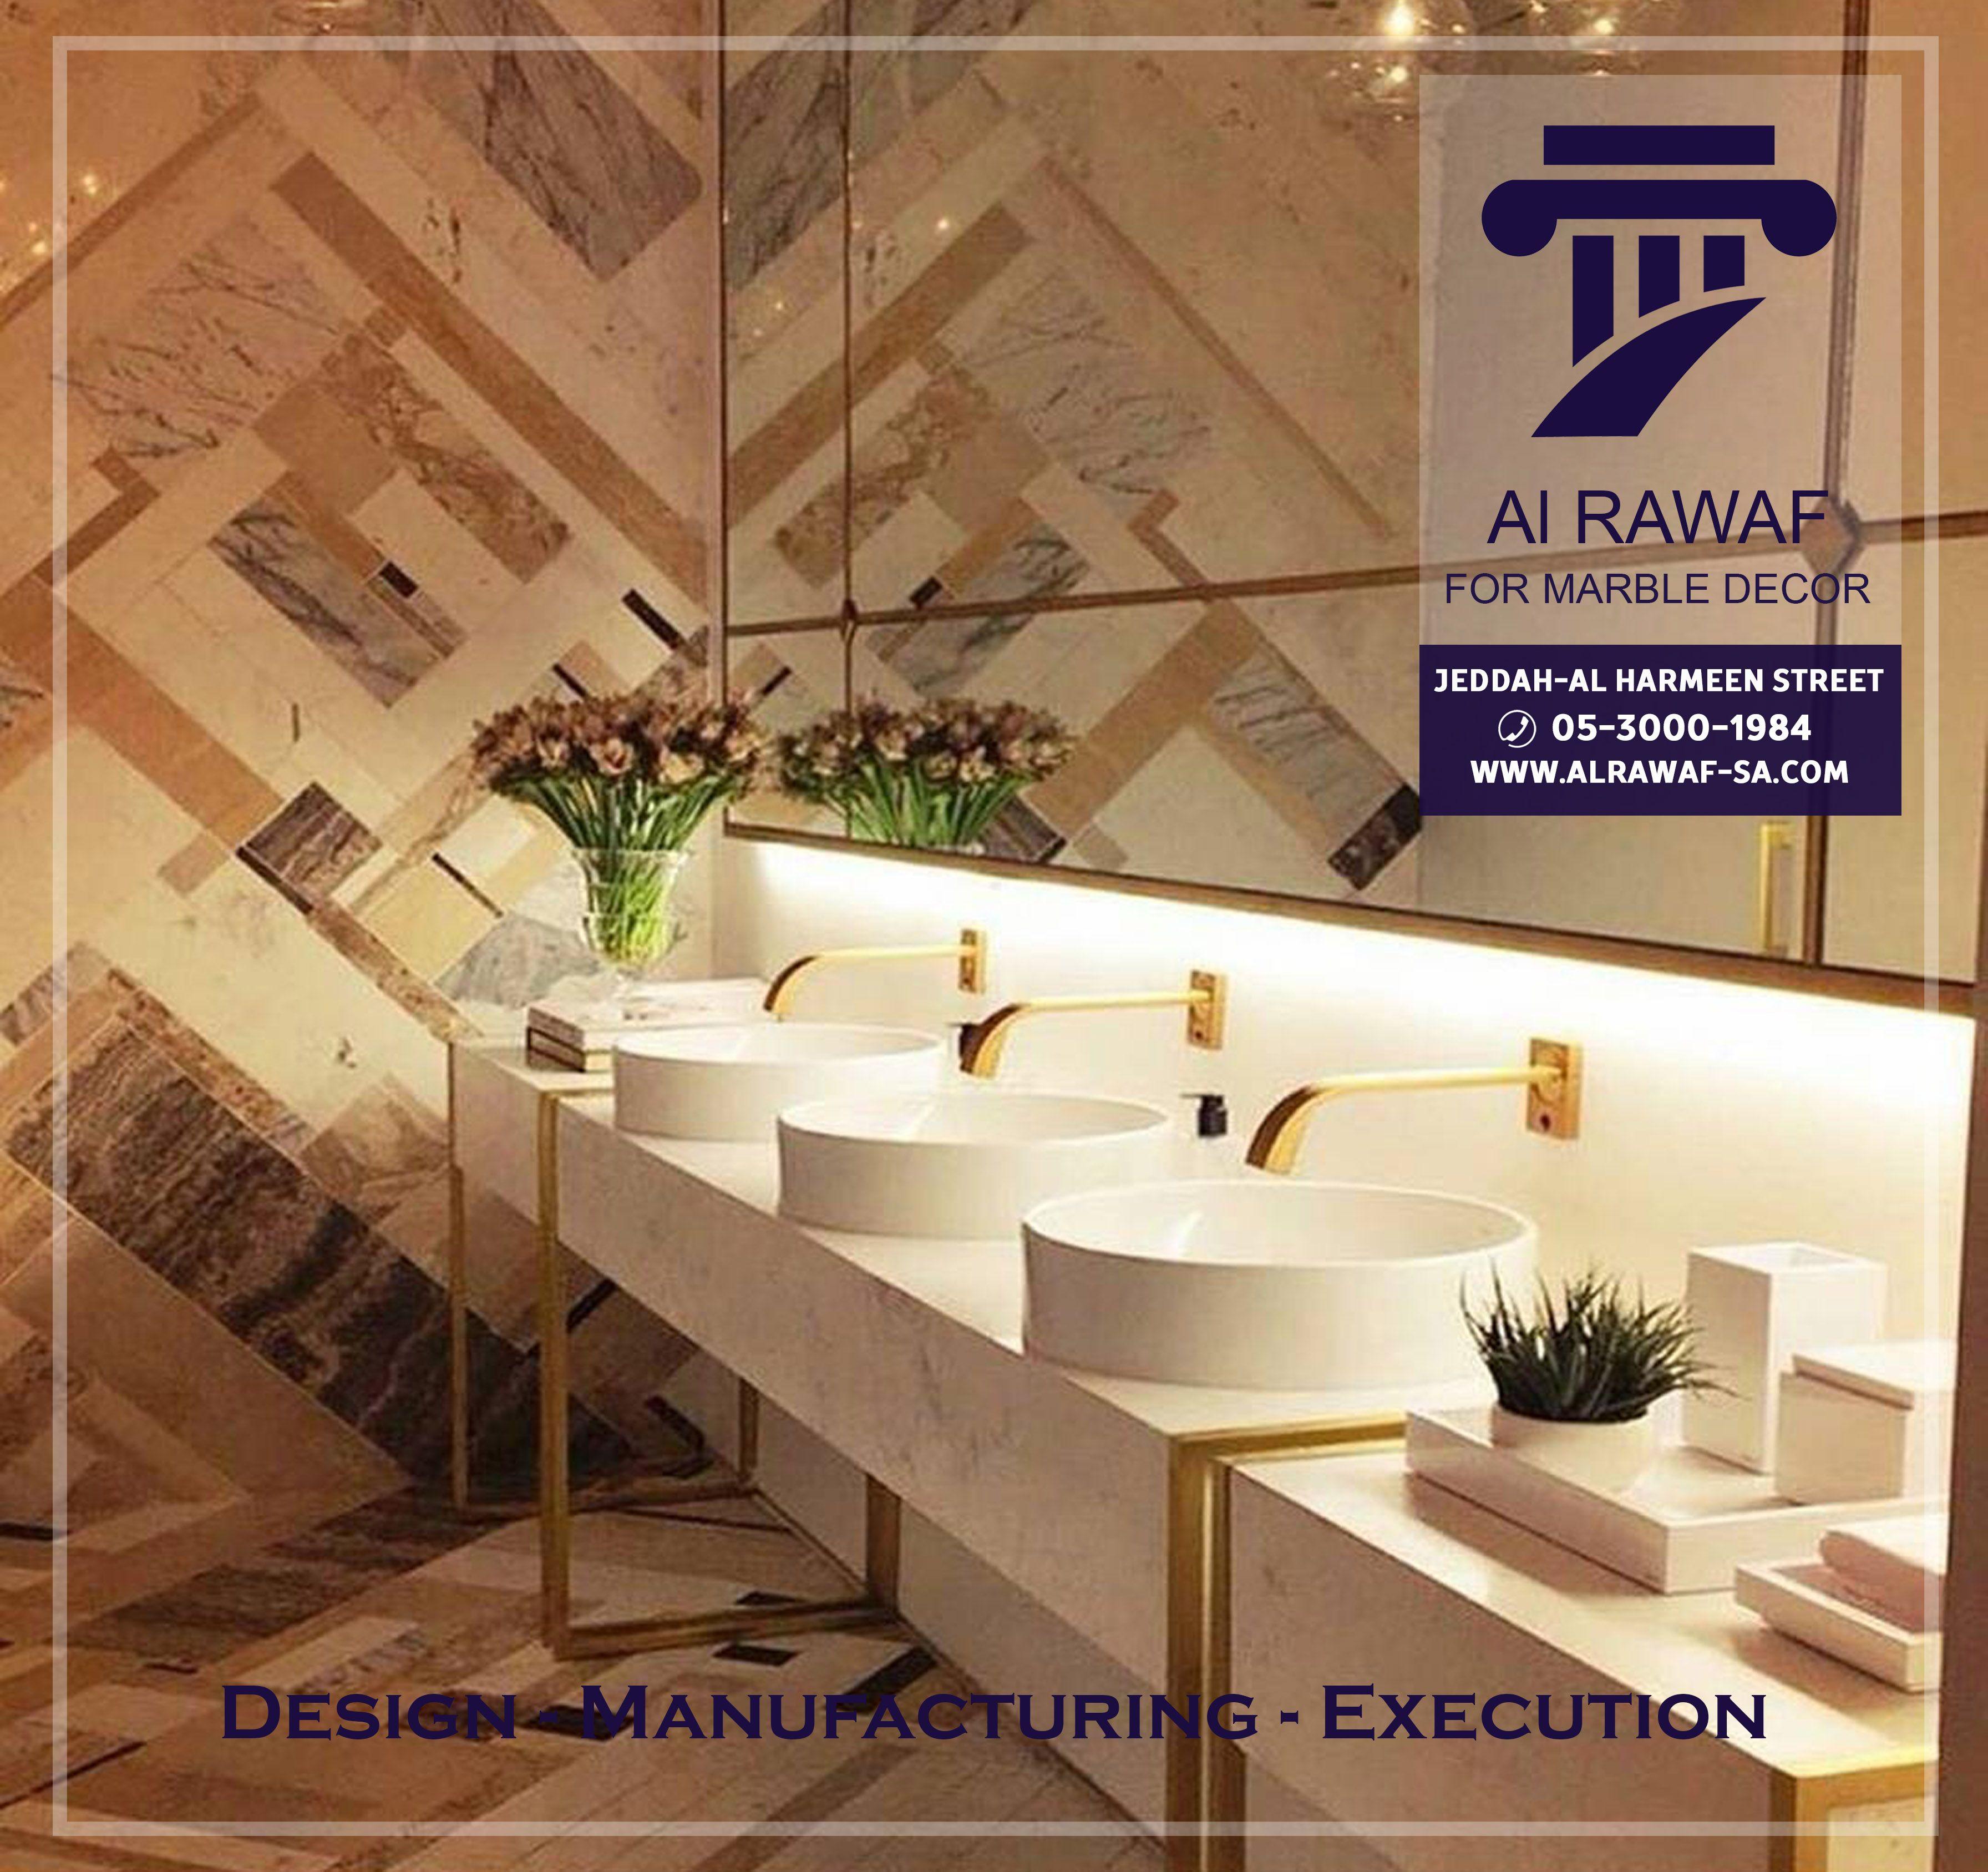 Pin By Mouneera Alrashoud On مغاسل Master Bedroom Lighting Marble Decor Bathroom Style